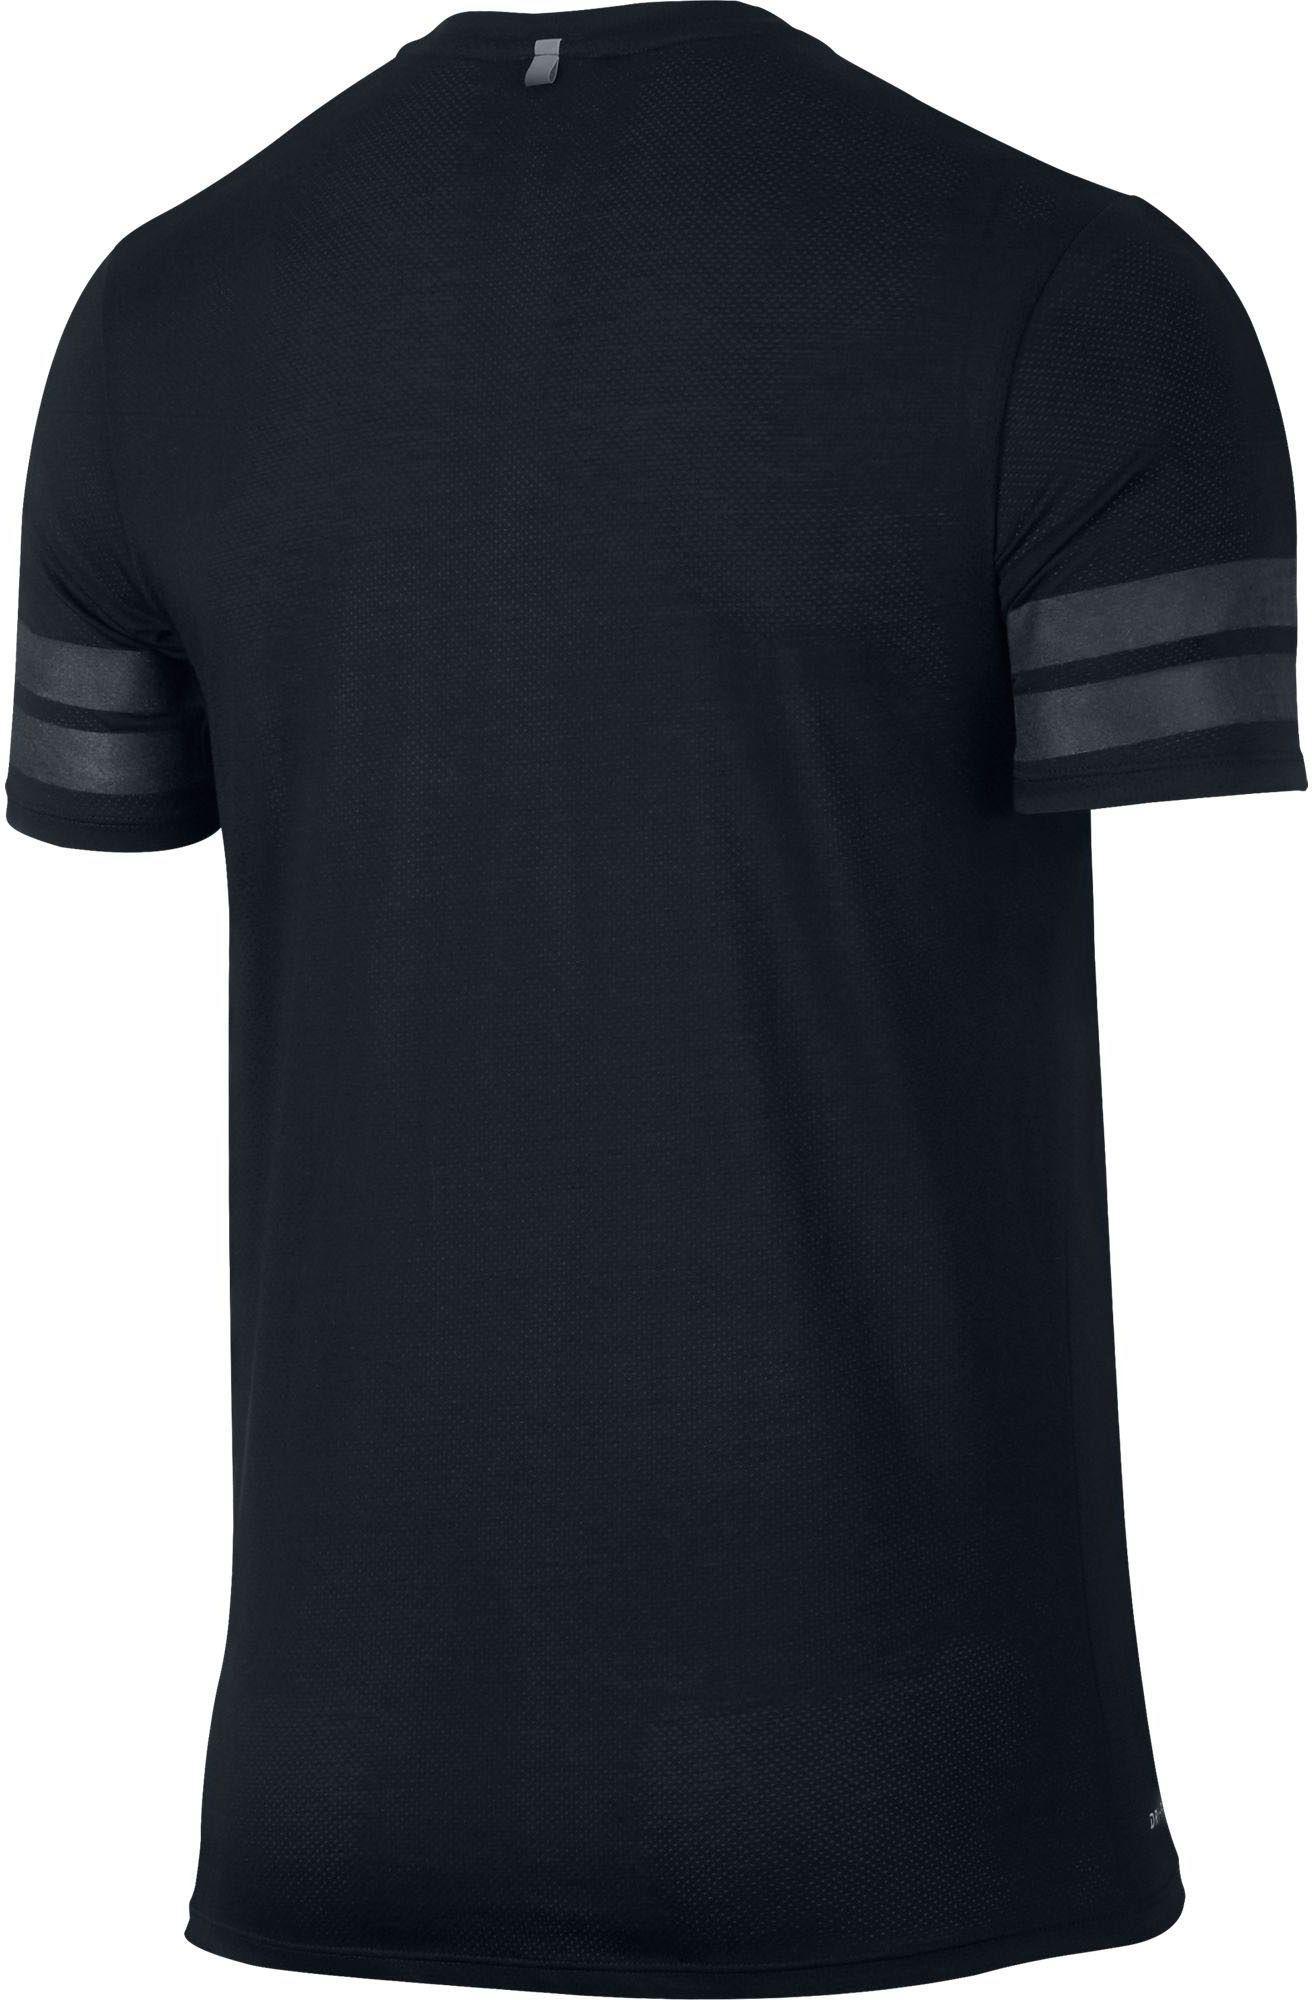 d19d8f3a10b6 Lyst - Nike Energy Usa Running T-shirt in Black for Men